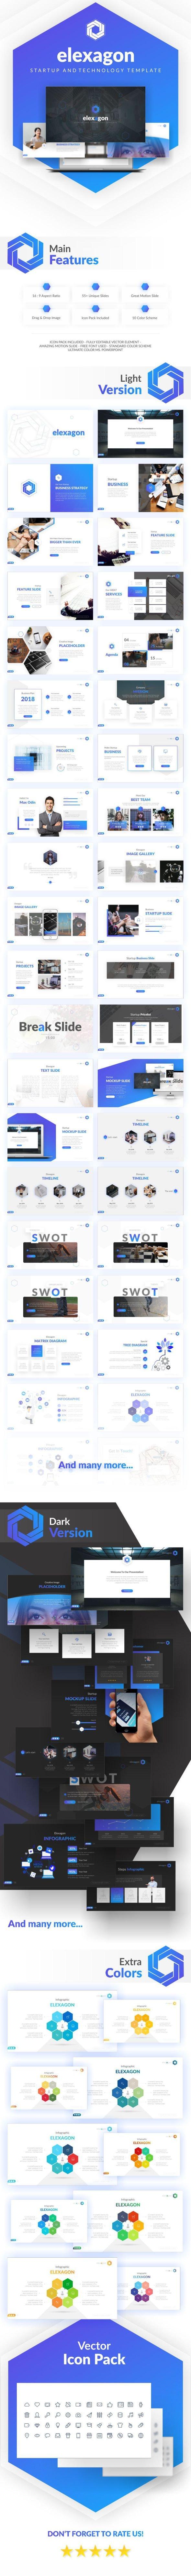 Elexagon Start Up PowerPoint Template - PowerPoint Templates Presentation Templates